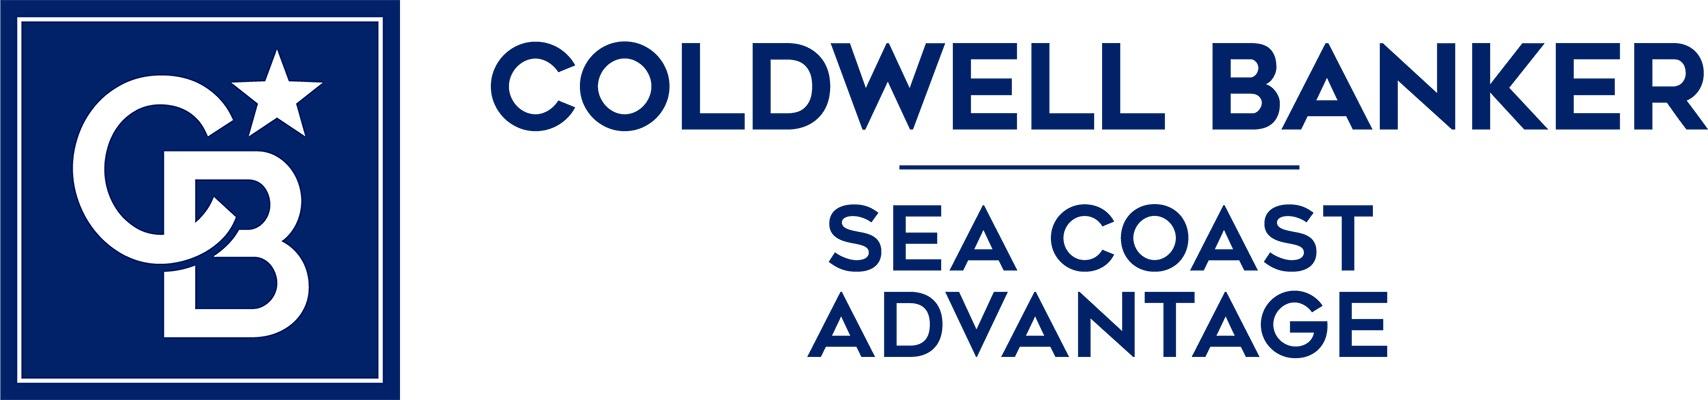 Corrin Dial - Coldwell Banker Sea Coast Advantage Realty Logo